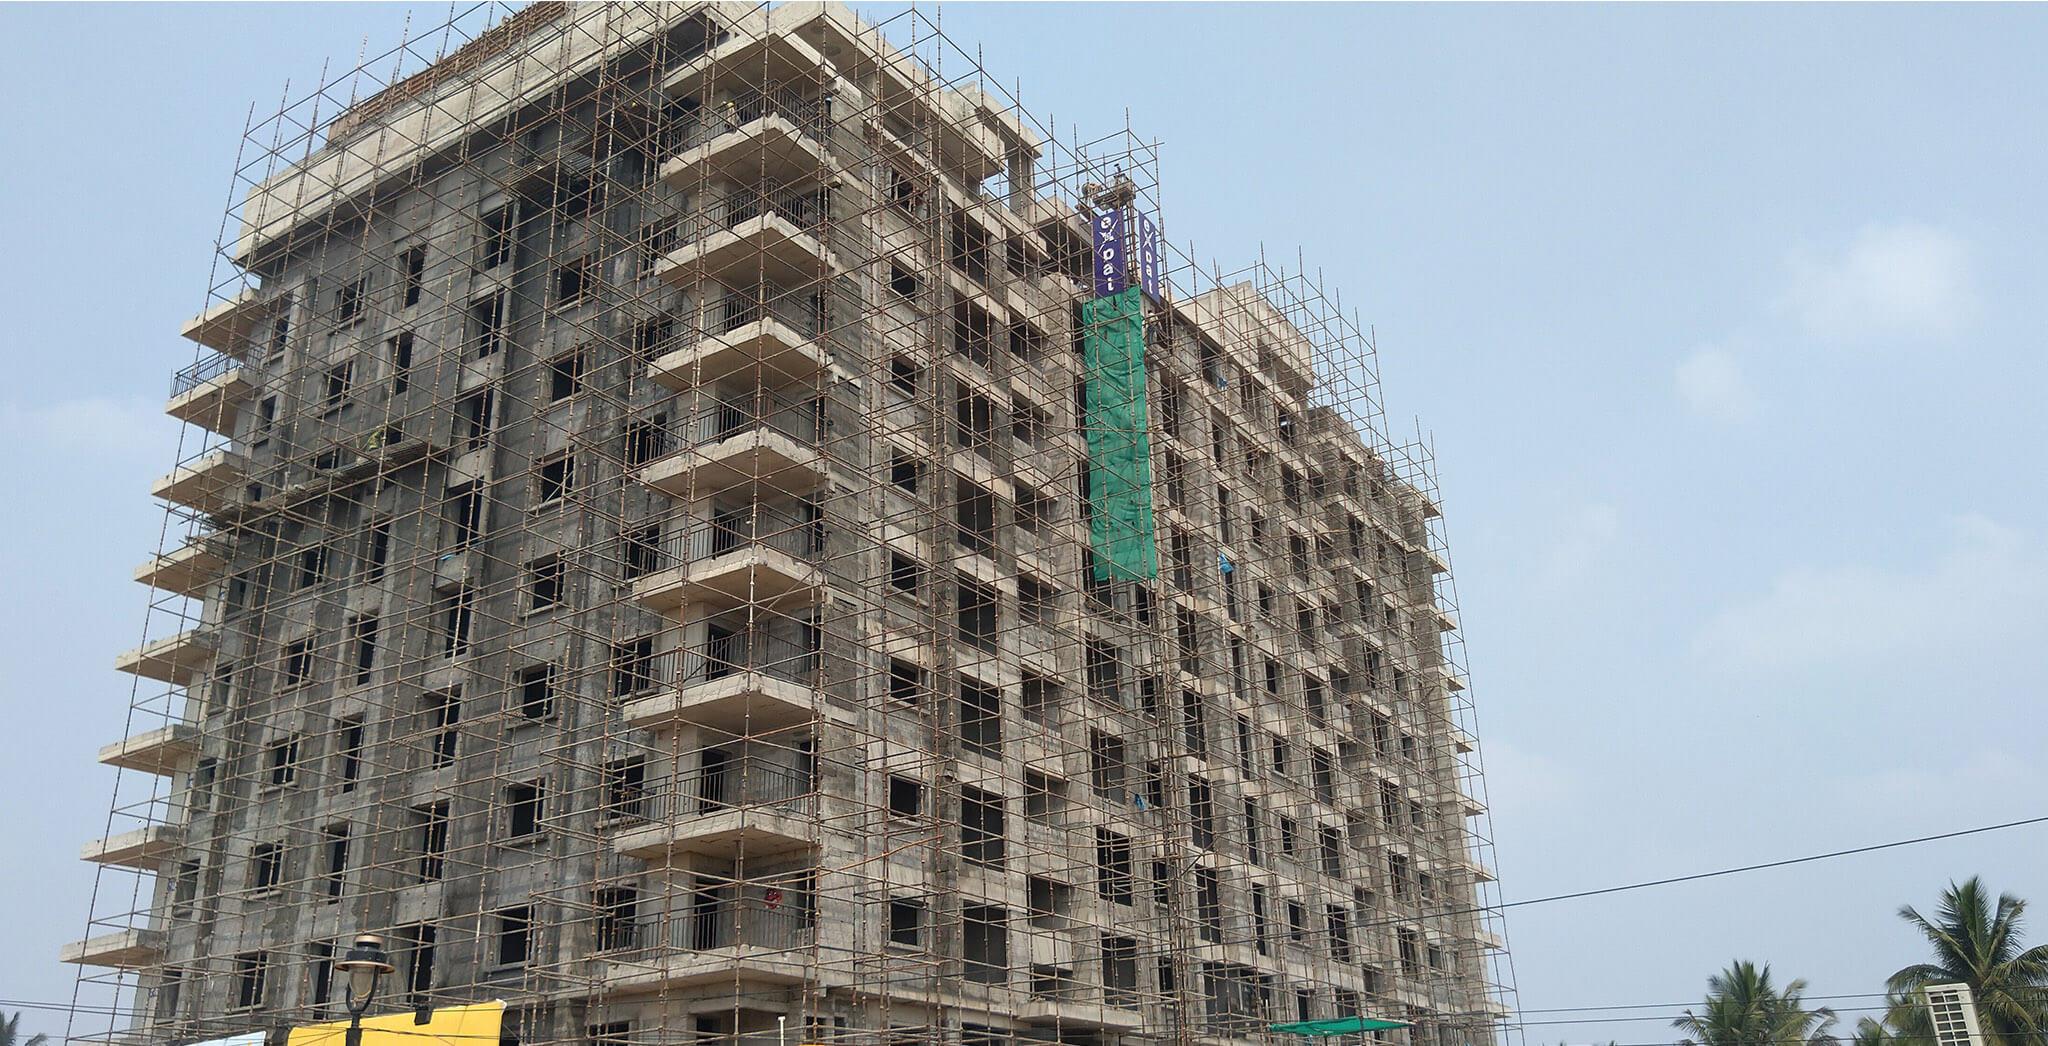 Mar 2020 - East elevation: Flooring block work completed